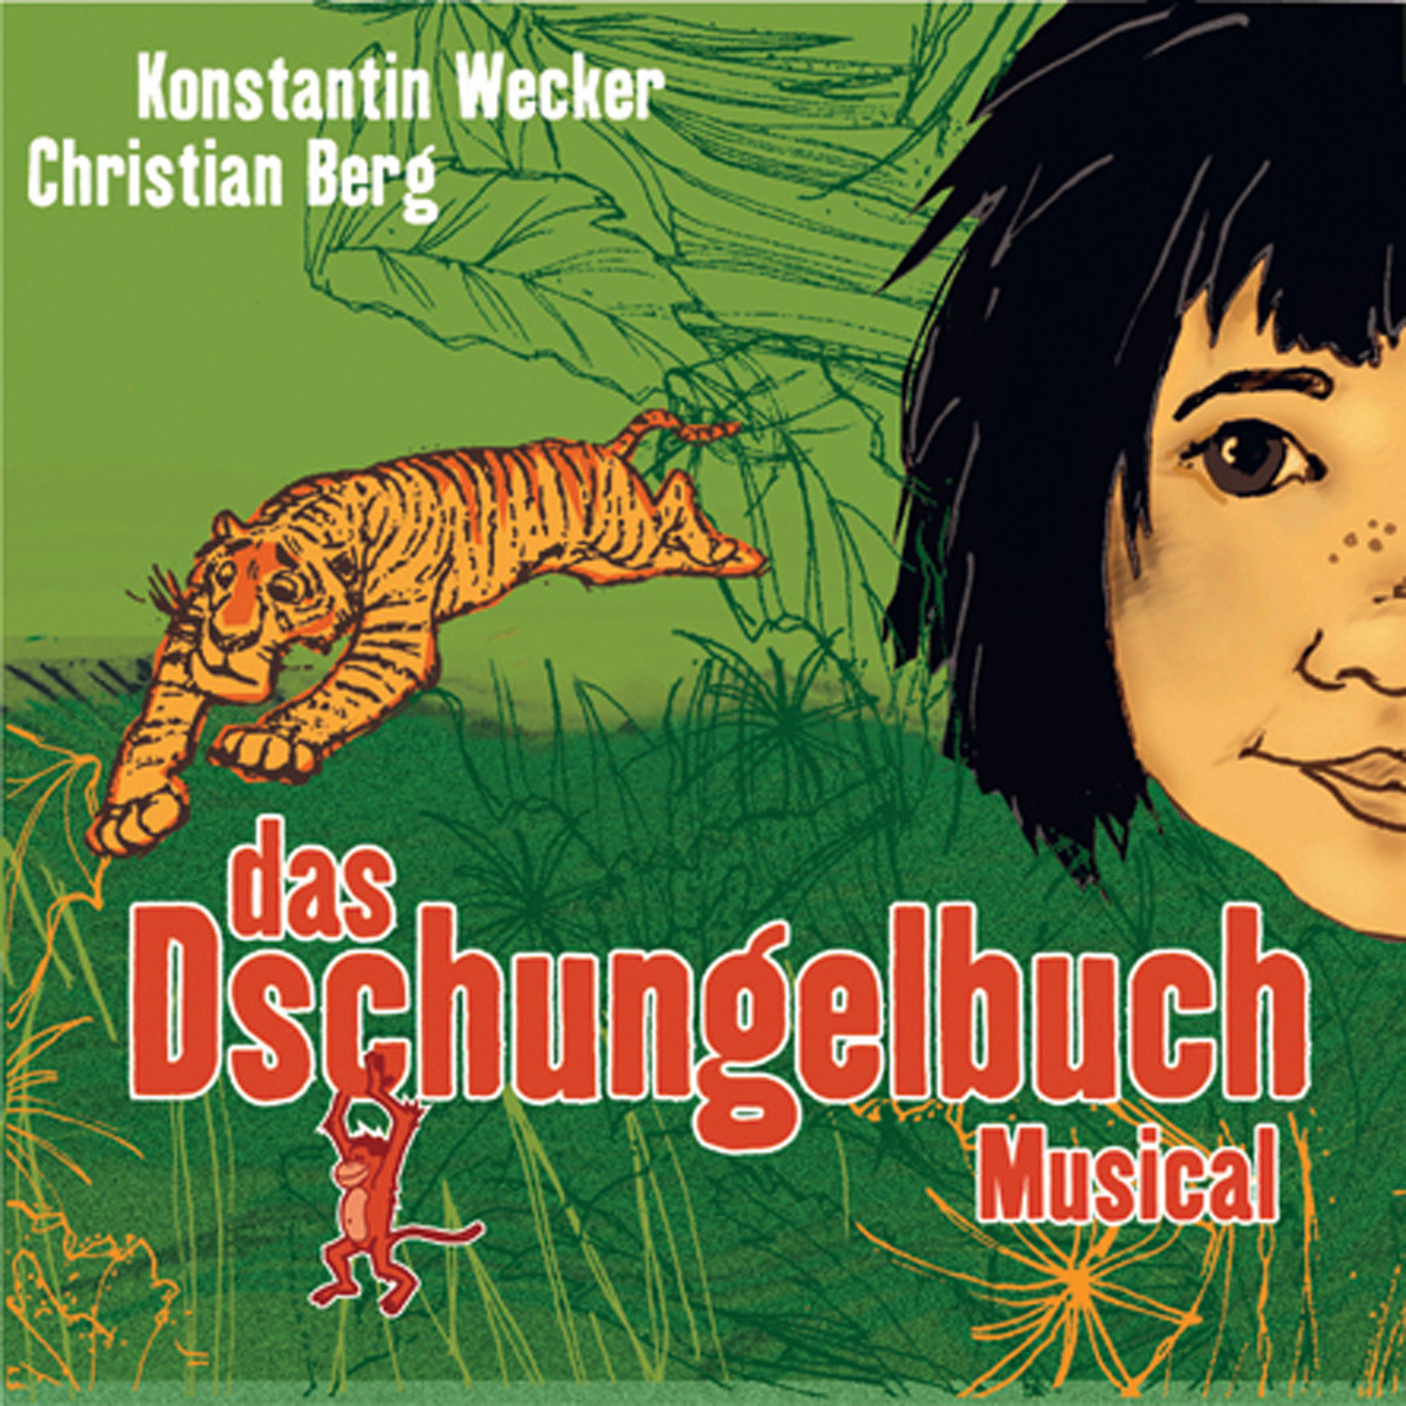 Musical Dschungelbuch